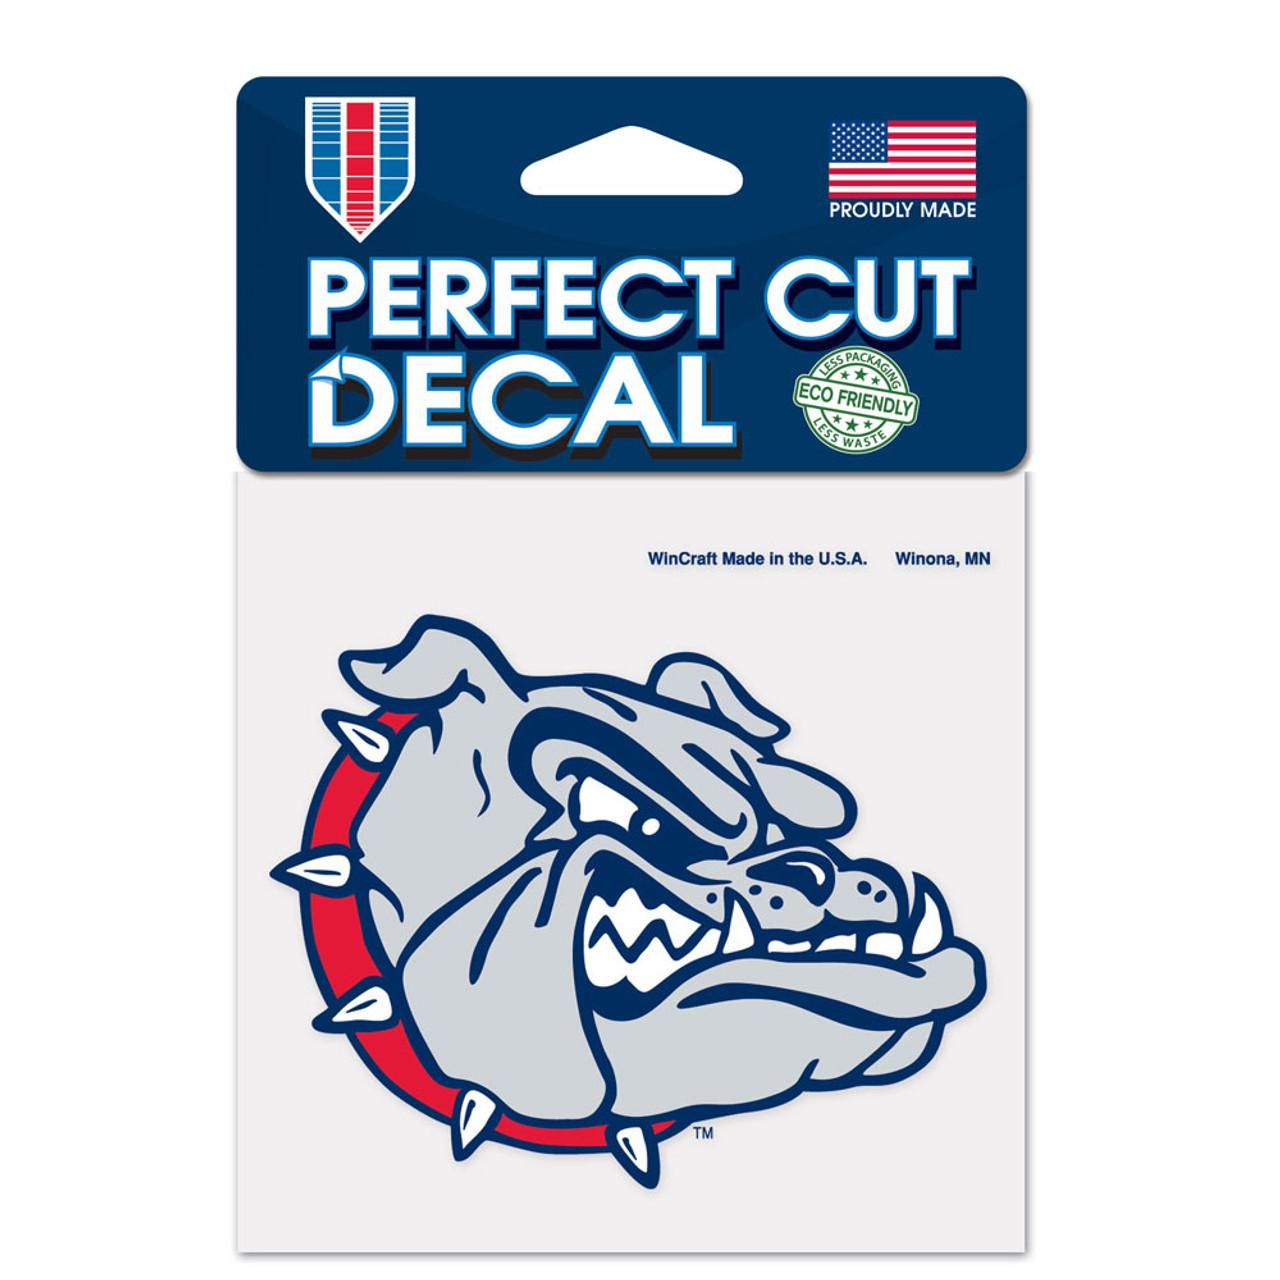 Gonzaga Bulldogs Decal 4x4 Perfect Cut Color - Special Order